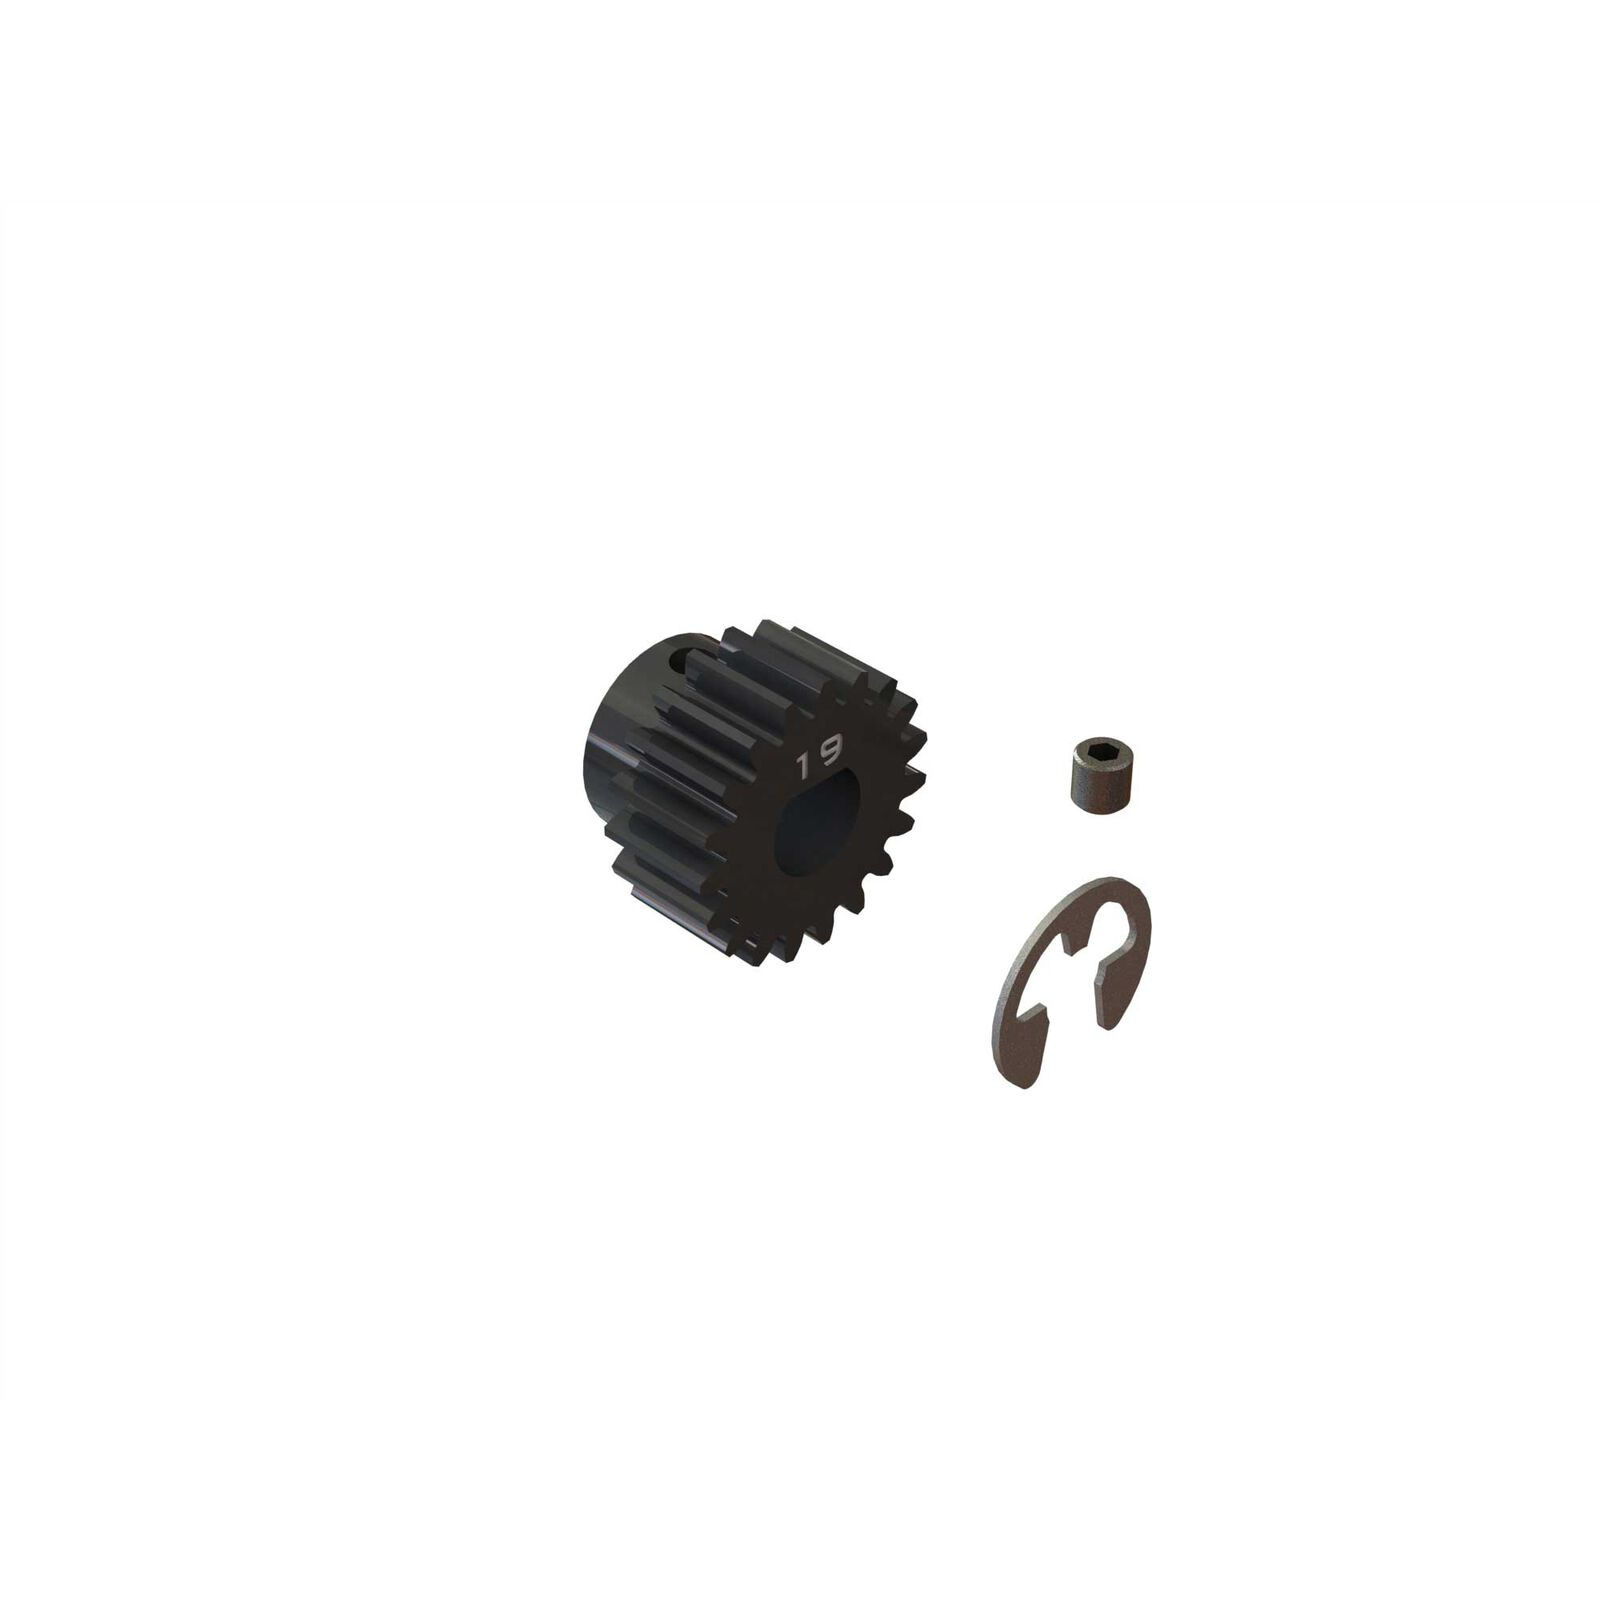 19T Mod1 Safe-D8 Pinion Gear